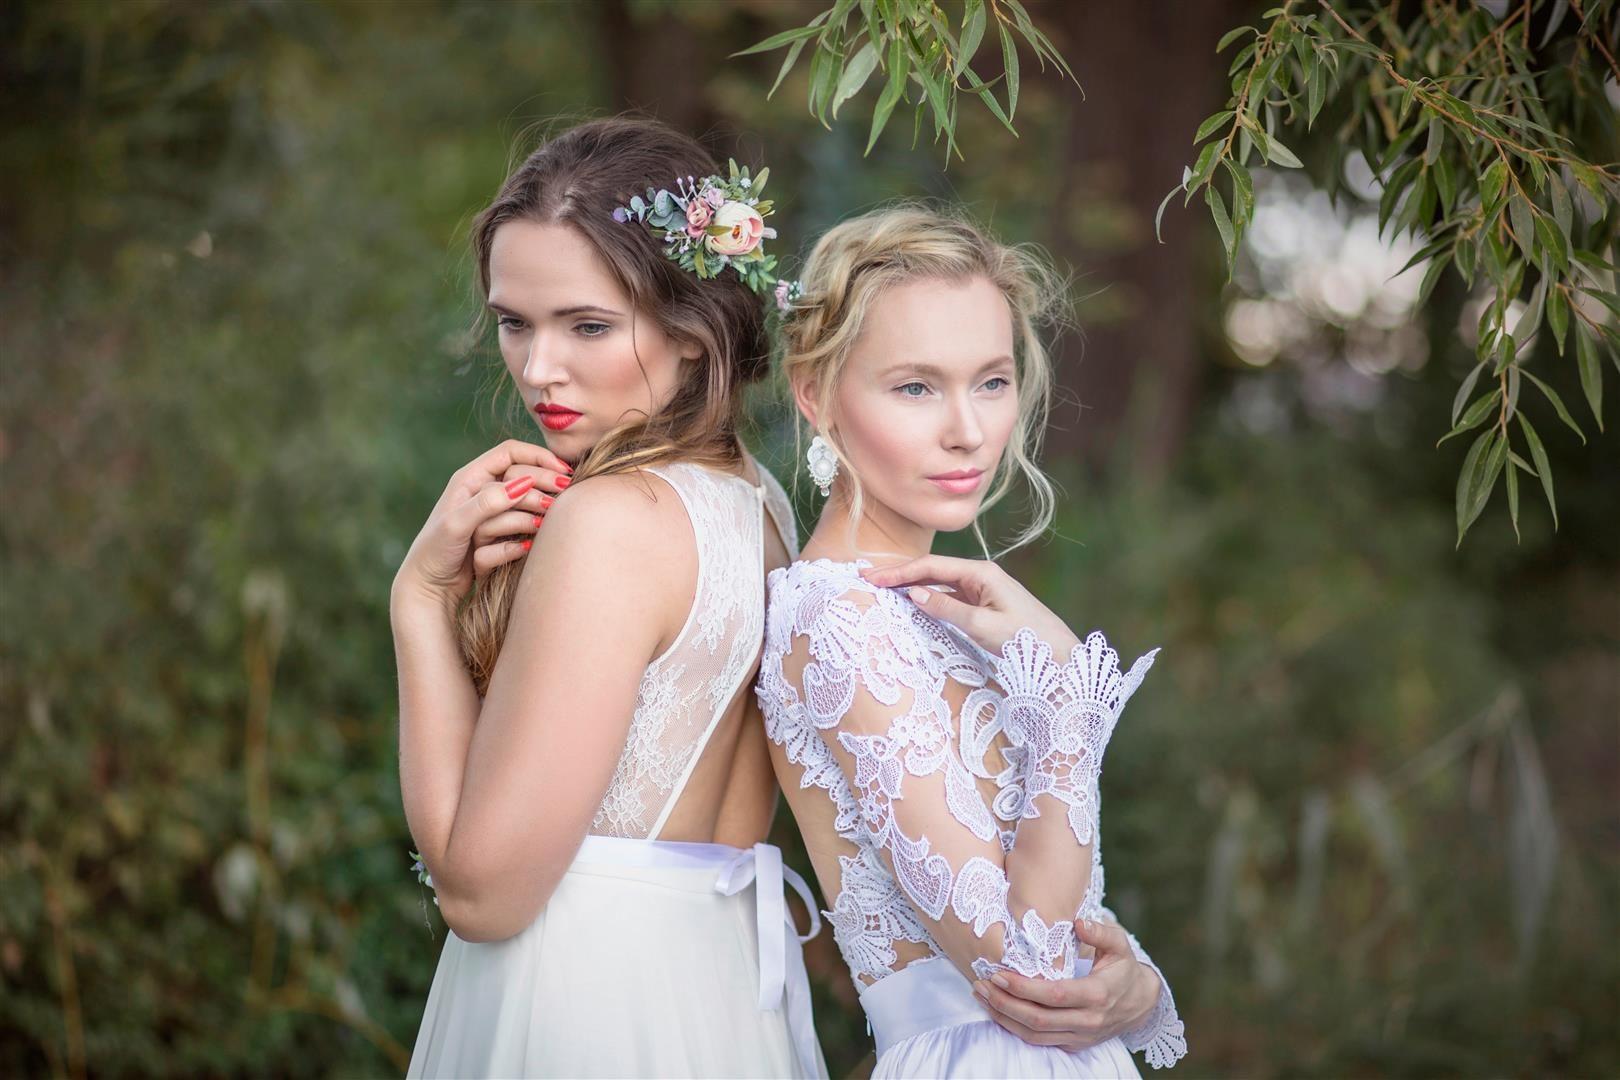 Foto: Sonia Reindeer, Modelka: Katarína Č., Marika Č. / Mix Model Management pre Mmagazin.sk